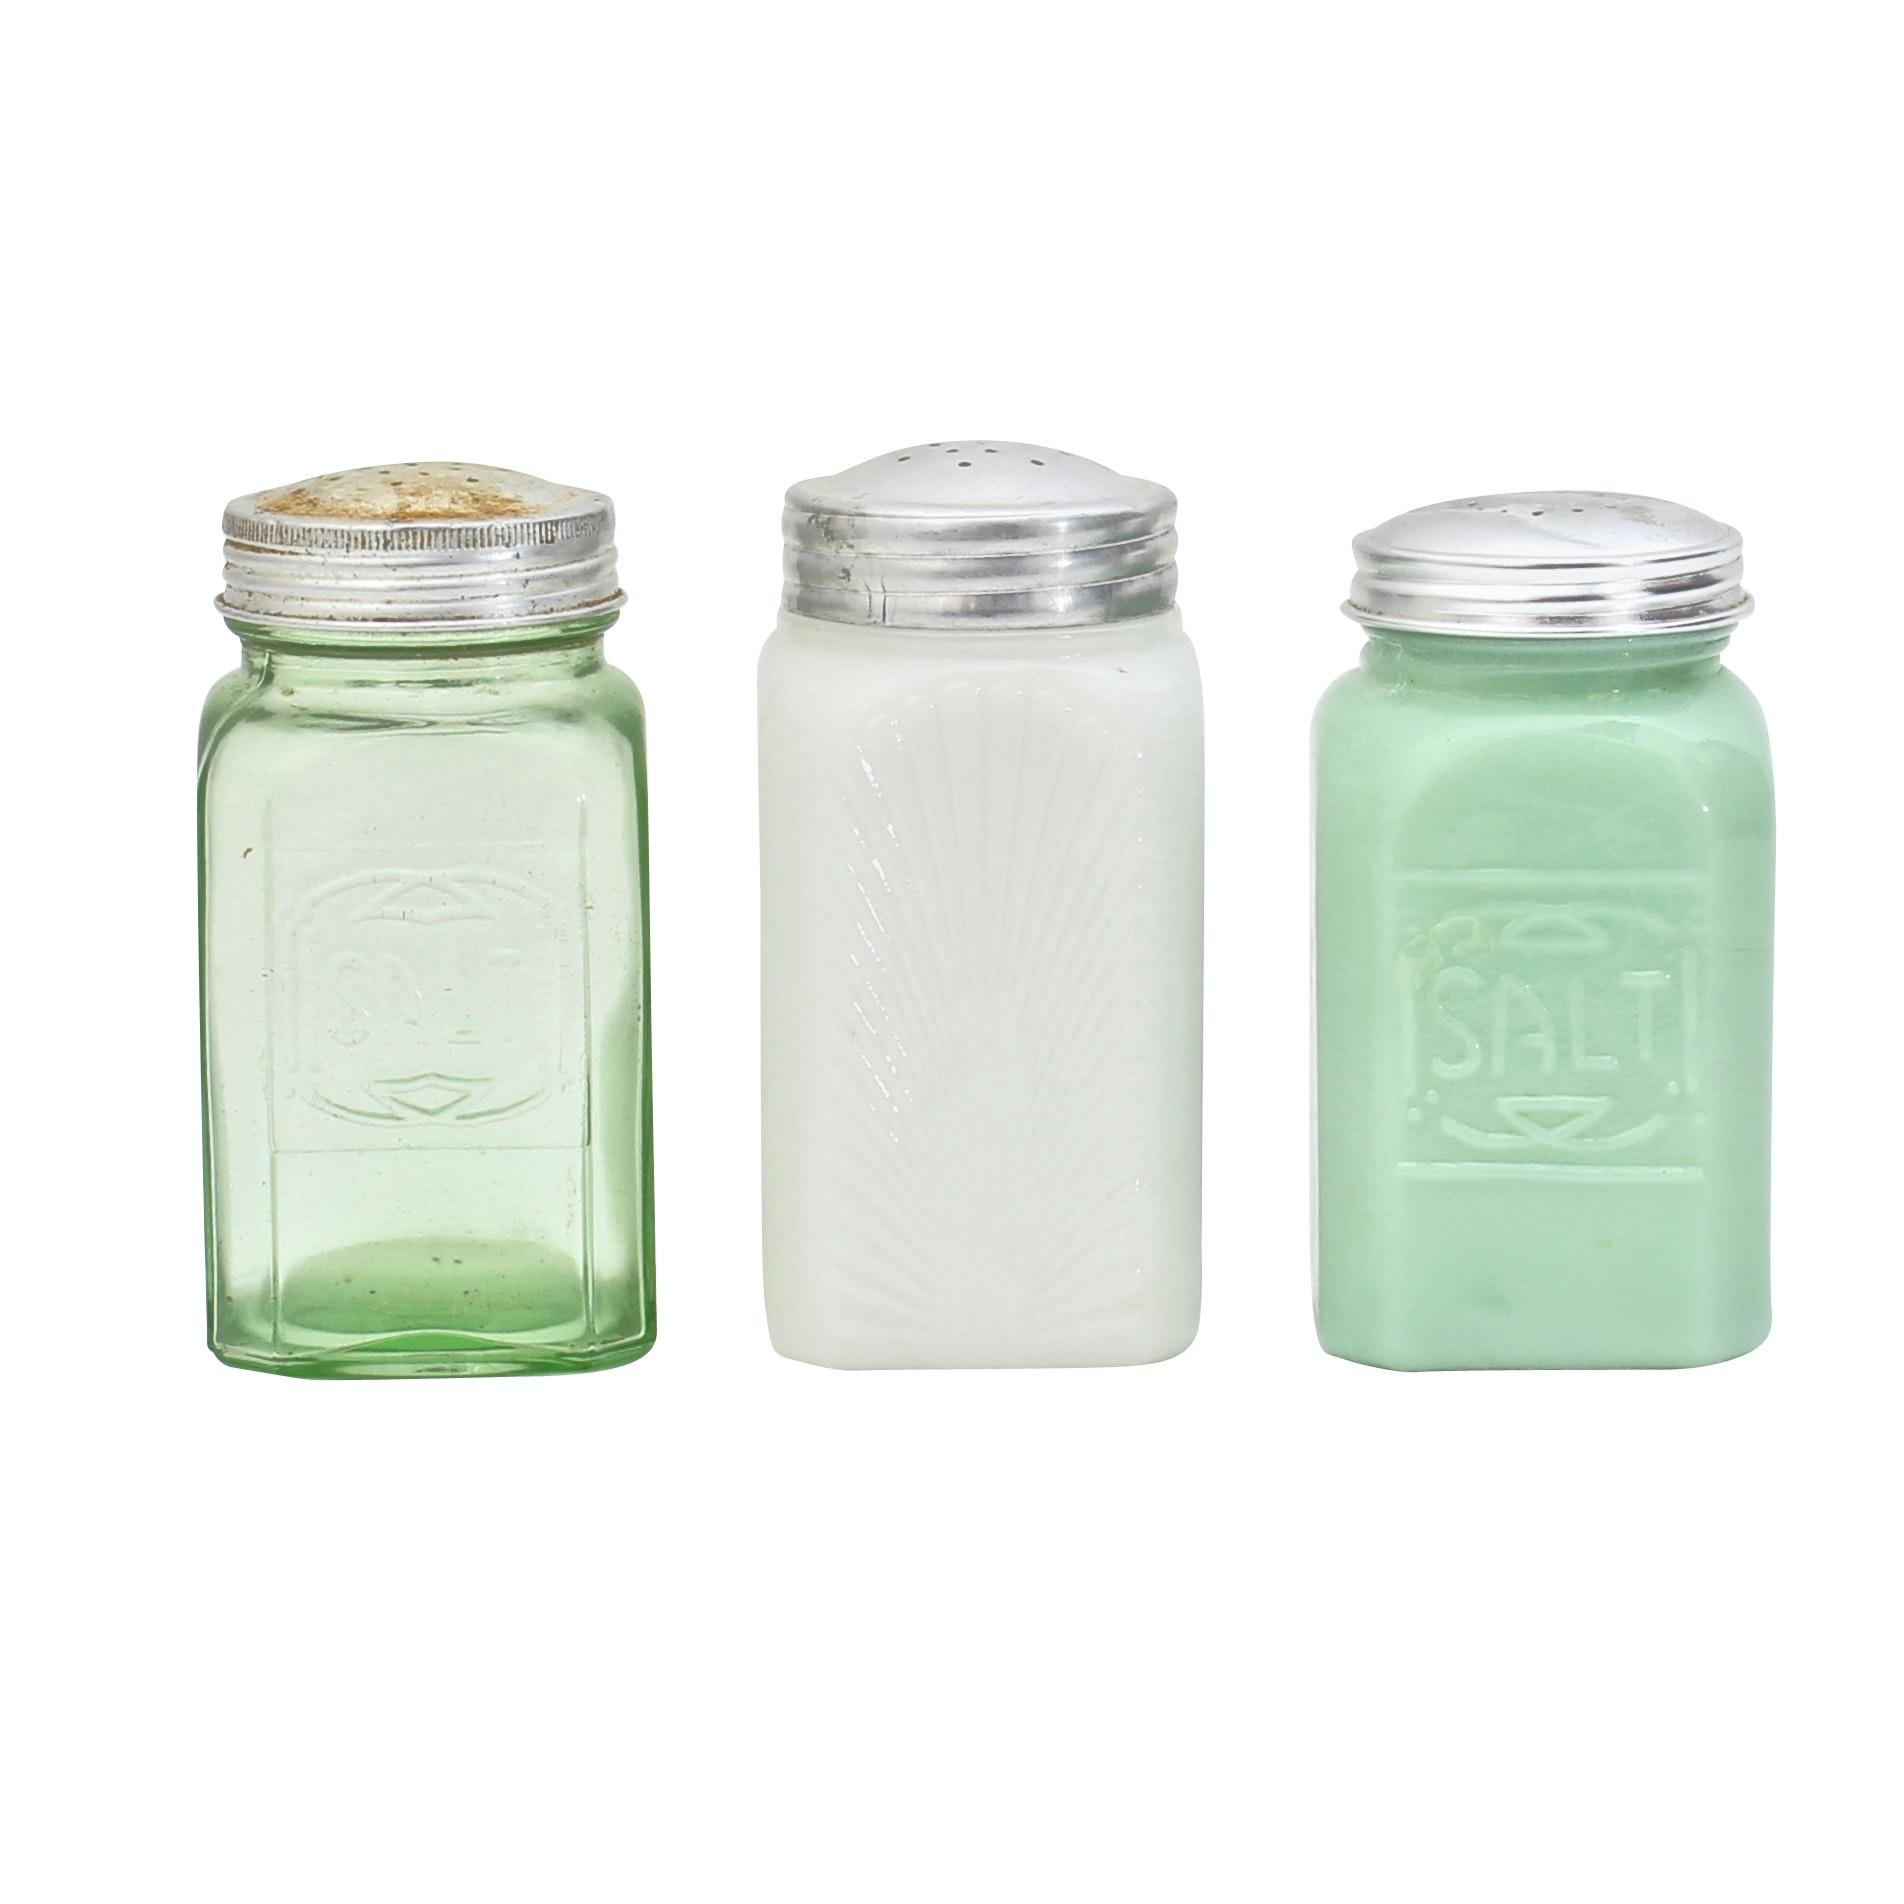 Vintage Single Salt & Pepper Shakers Including Jadeite and Milkglass